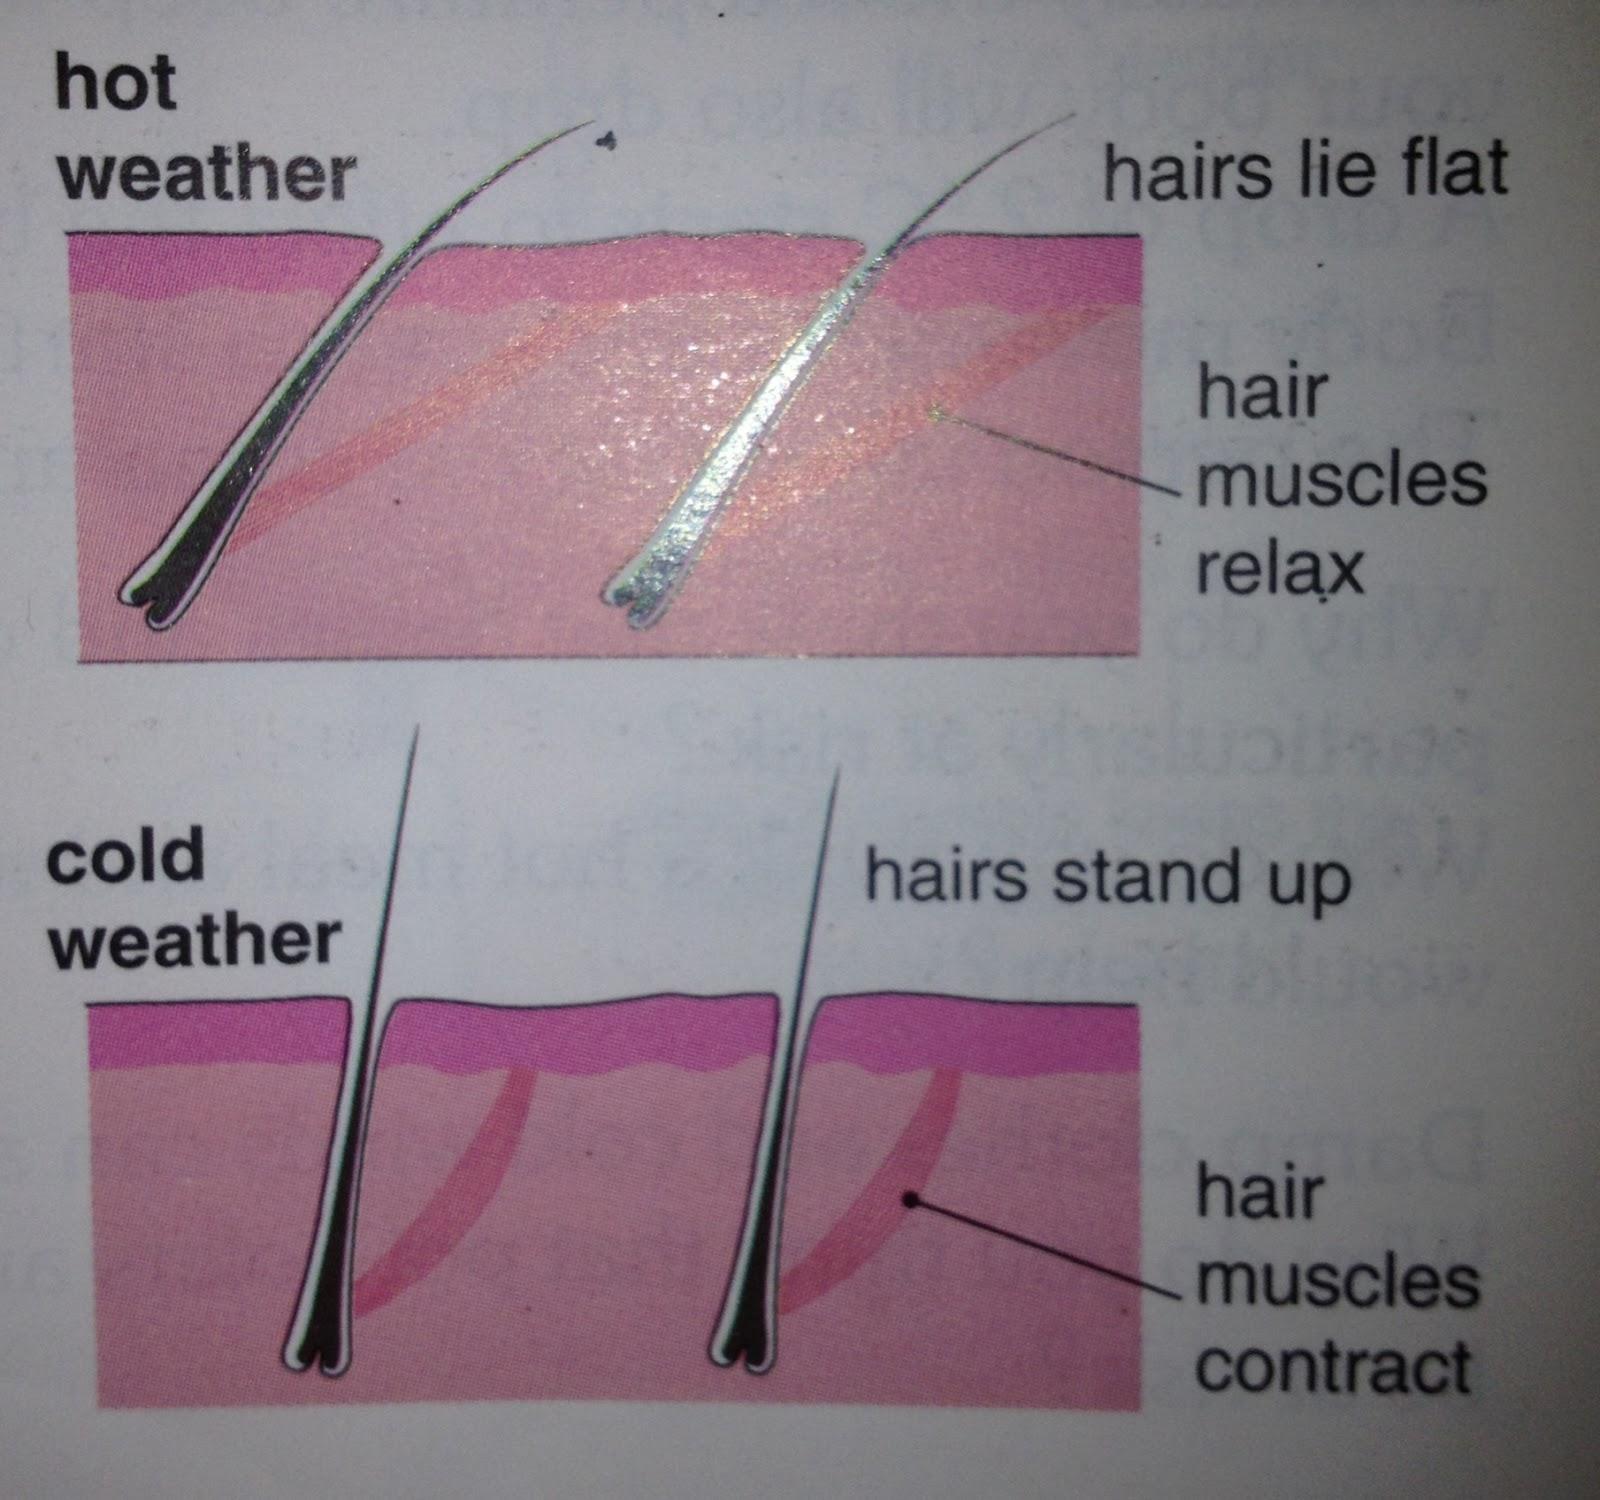 Charlotte's Biology Blog: 2.88 - Skin temperature regulation